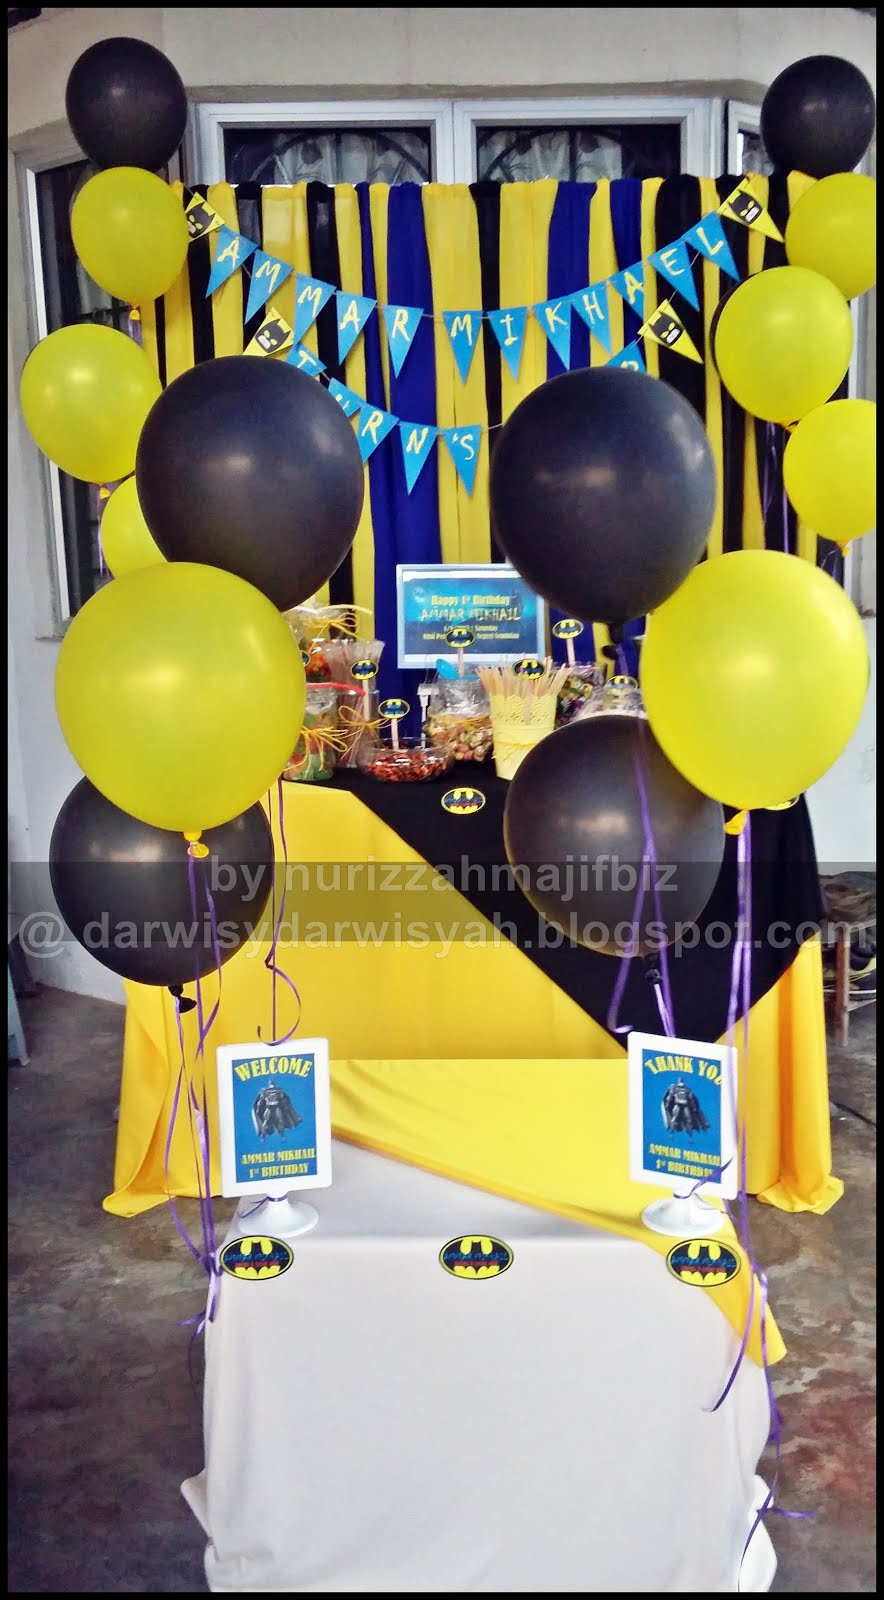 Birthday Celebration Ammar Mikhail | 01/08/2015 @ Nilai Perdana, Nilai, Neg. Sembilan